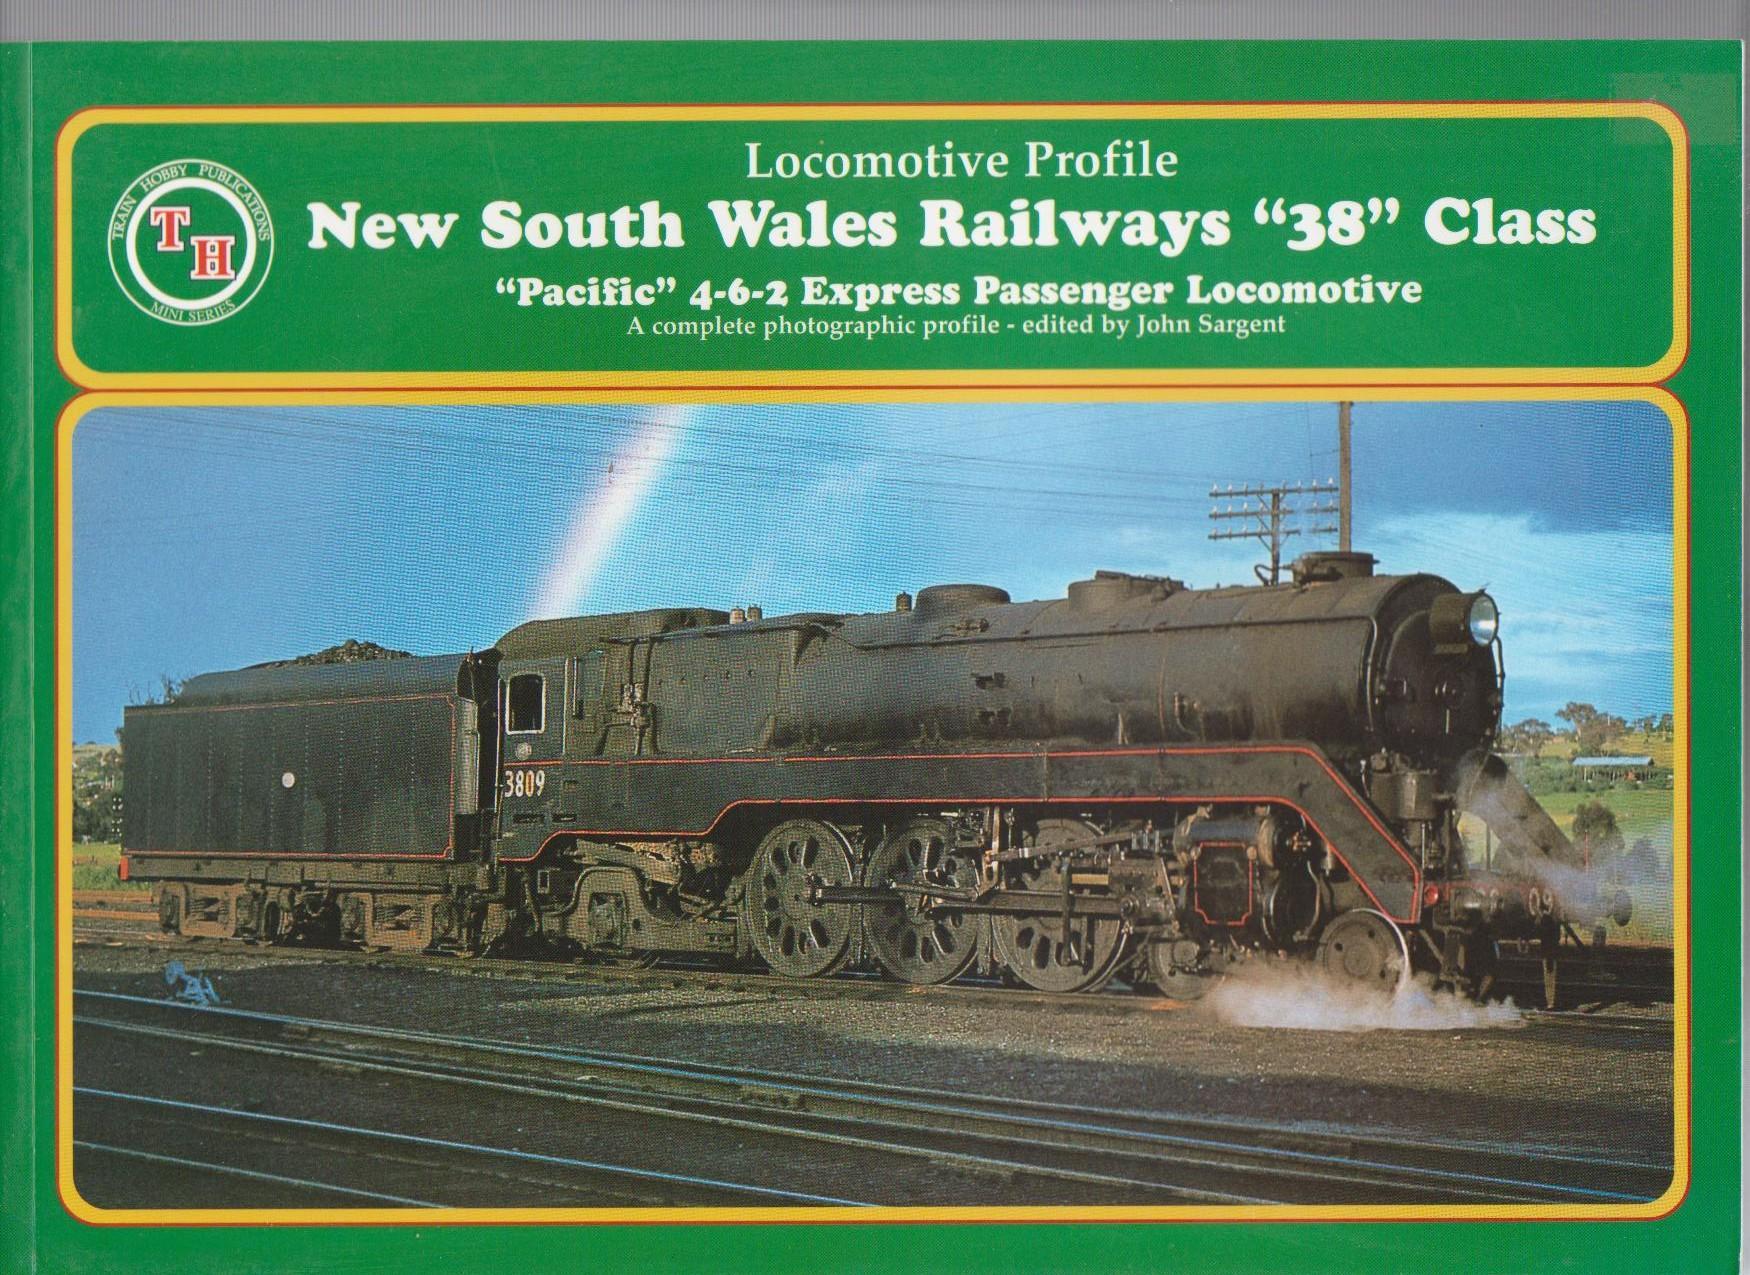 LOCOMOTIVE PROFILE  New South Wales Railways